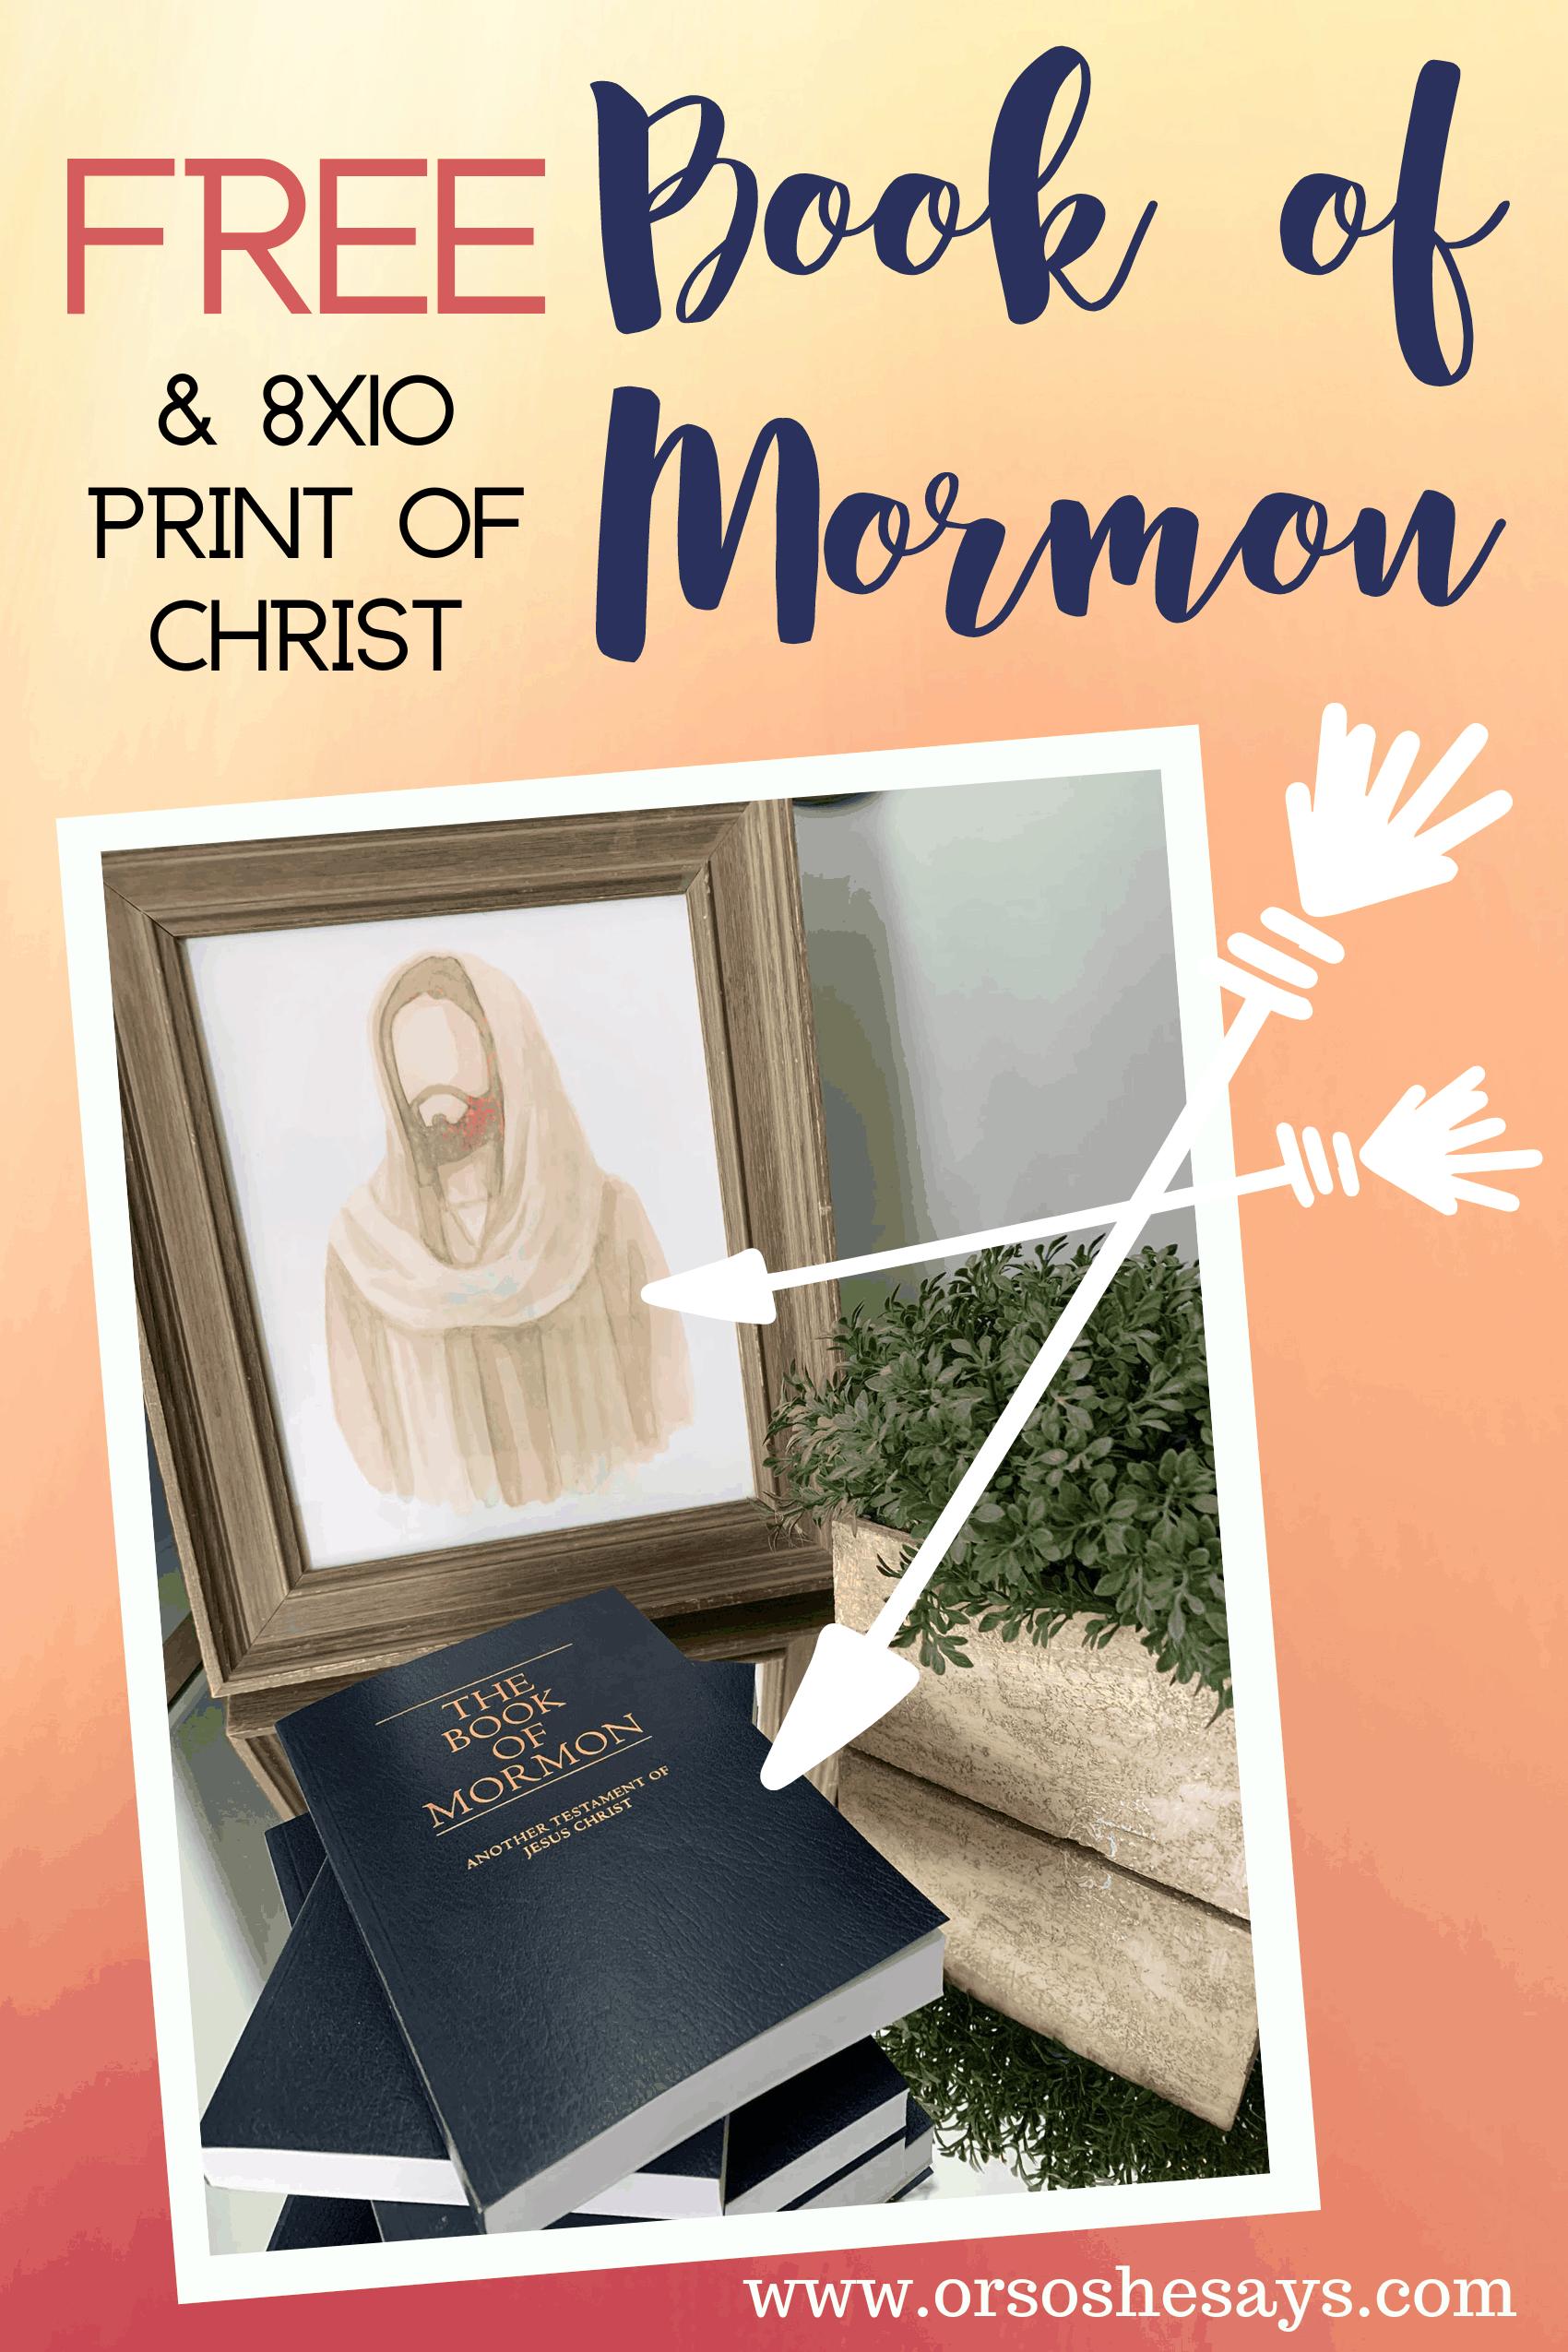 Free Book of Mormon and 8x10 Print of Christ www.orsoshesa.com